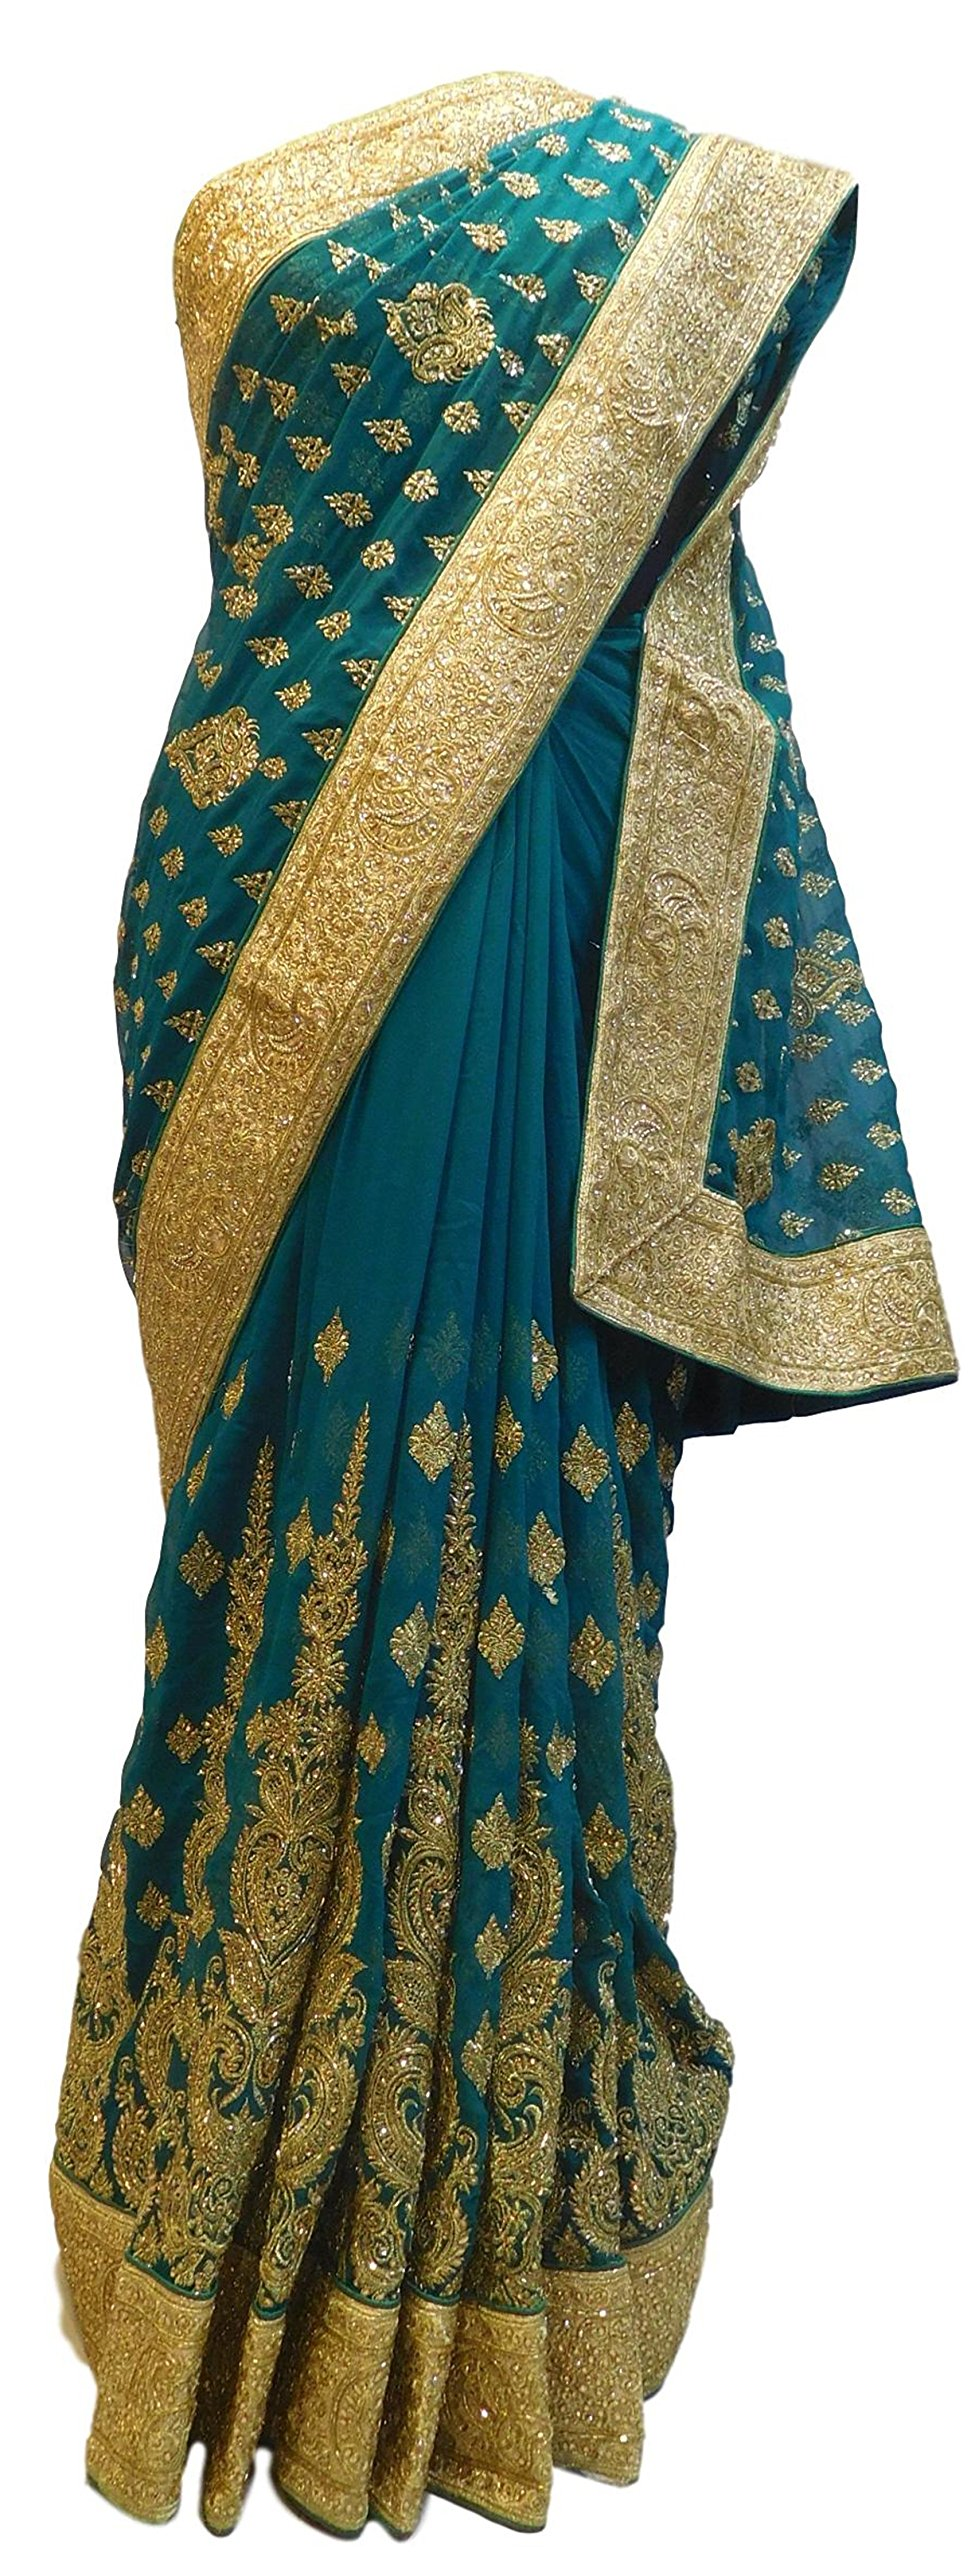 SMSAREE Turquoise Designer Bridal PartyWear Georgette Cutdana Zari Stone Work Wedding Saree Sari E020